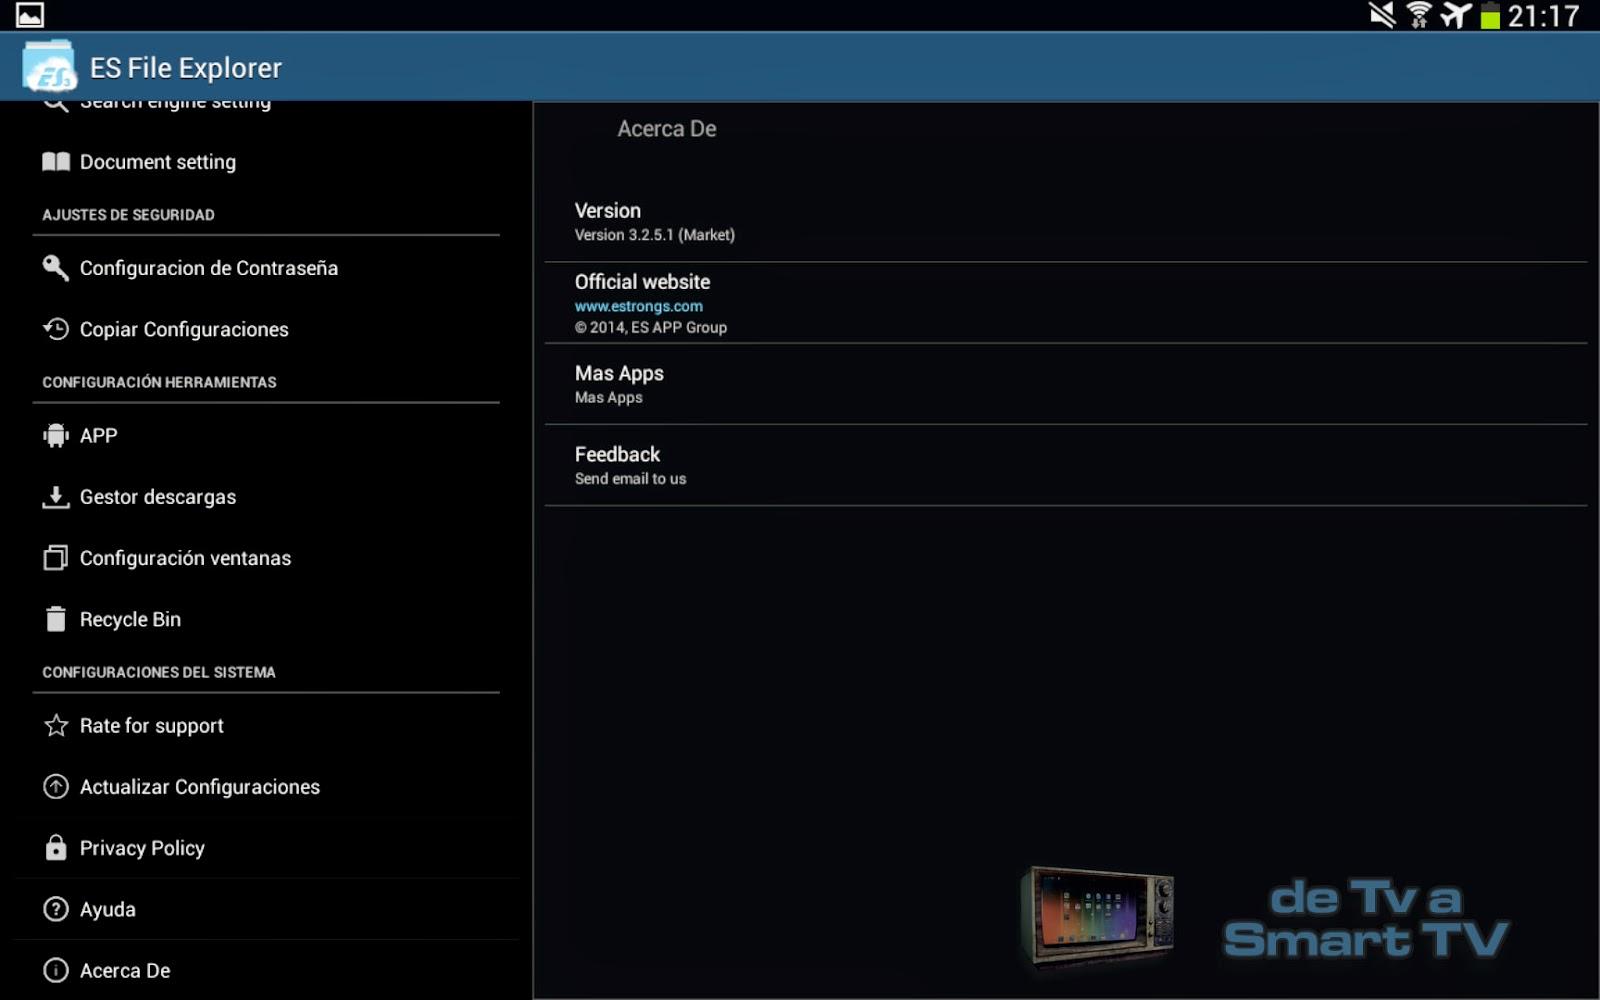 ES File Explorer - De TV a SmartTV